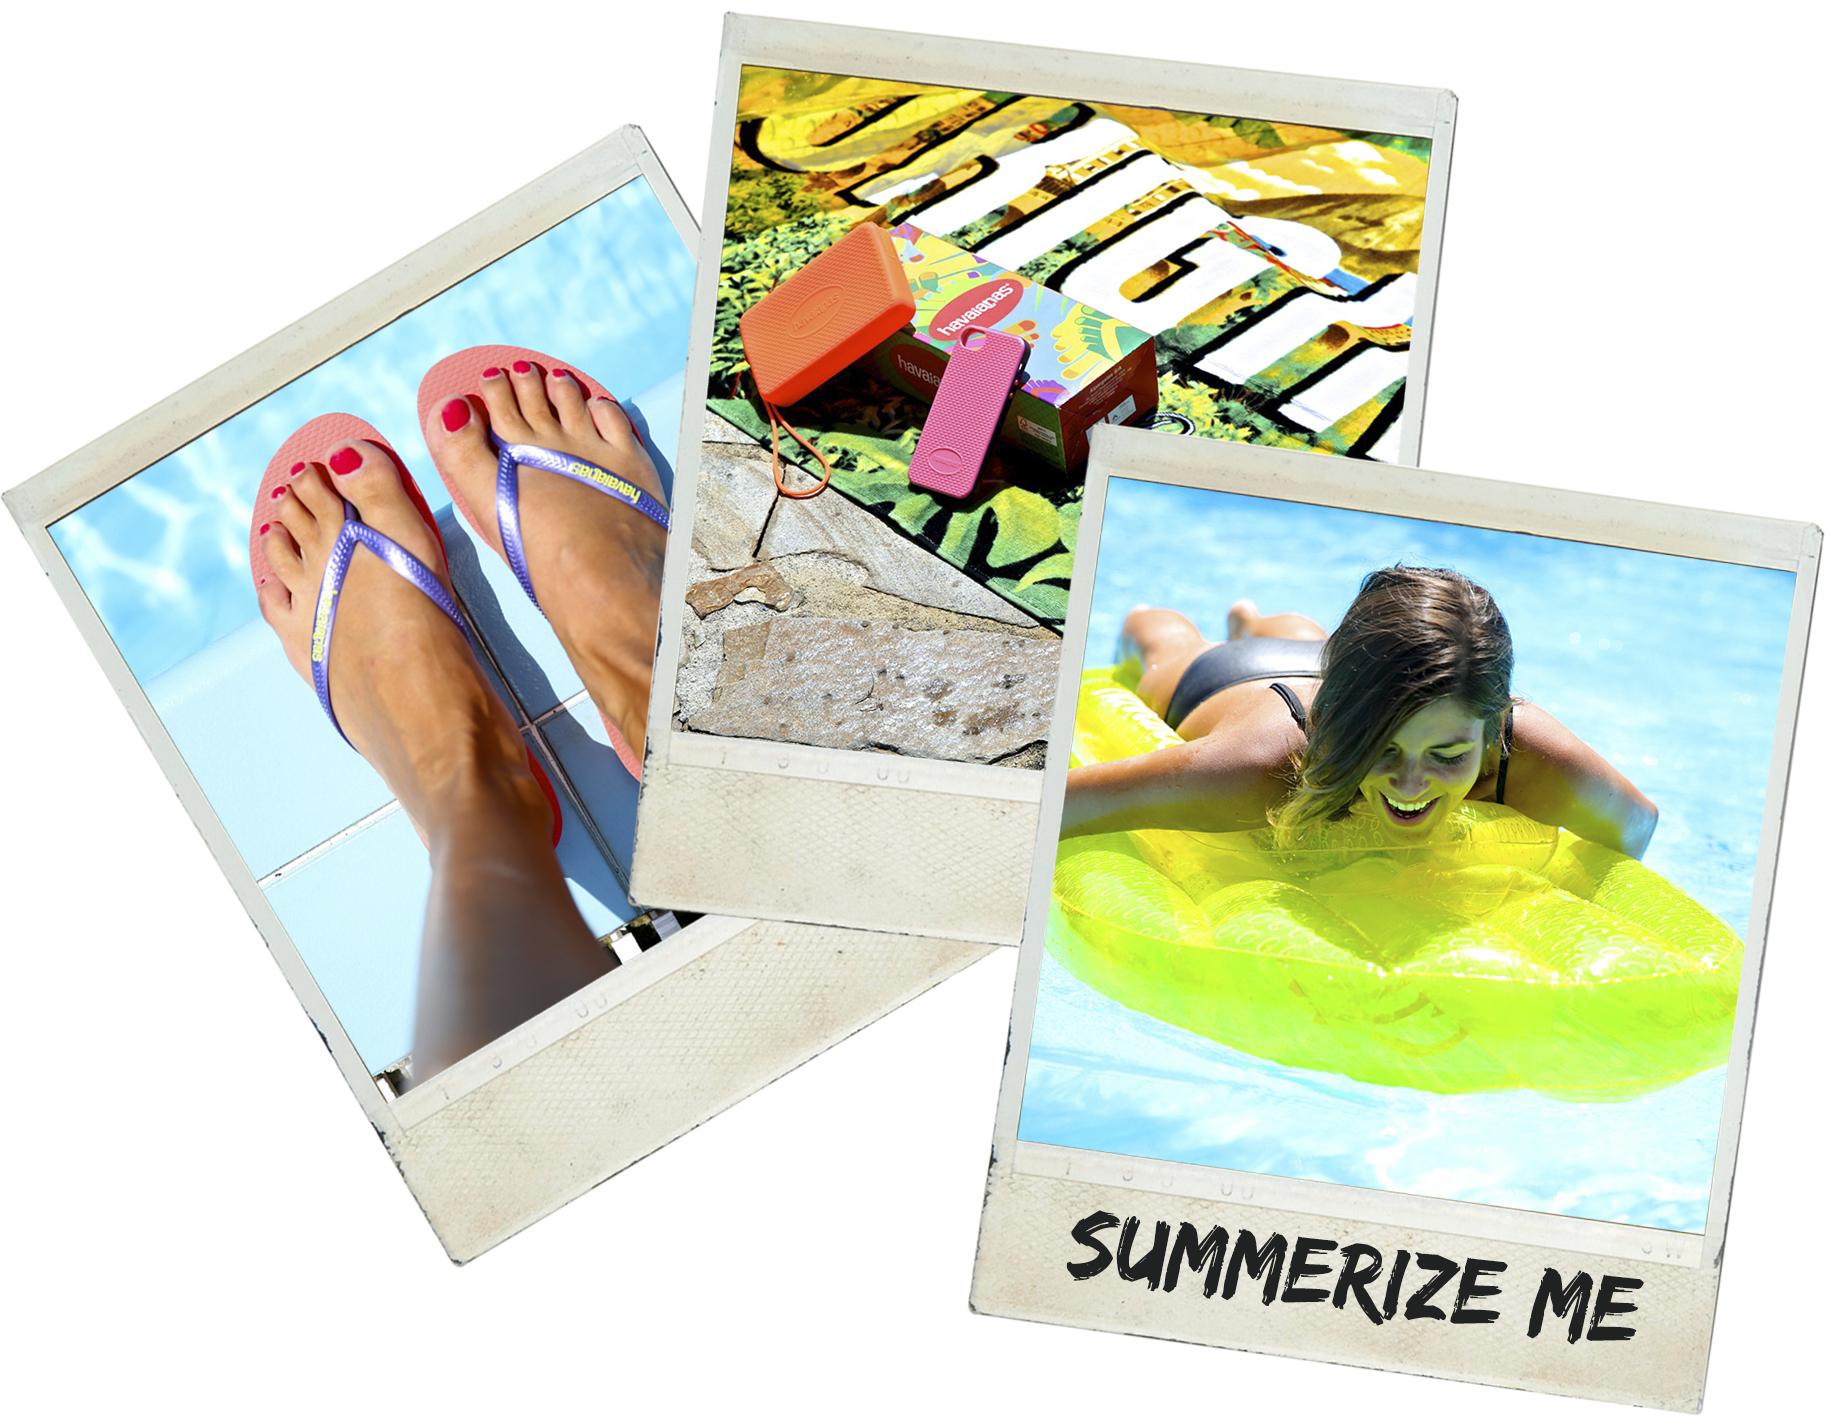 trendy_taste-look-outfit-street_style-ootd-blog-blogger-fashion_spain-moda_españa-verano-summer-sandalias-havaianas-concurso-polaroid